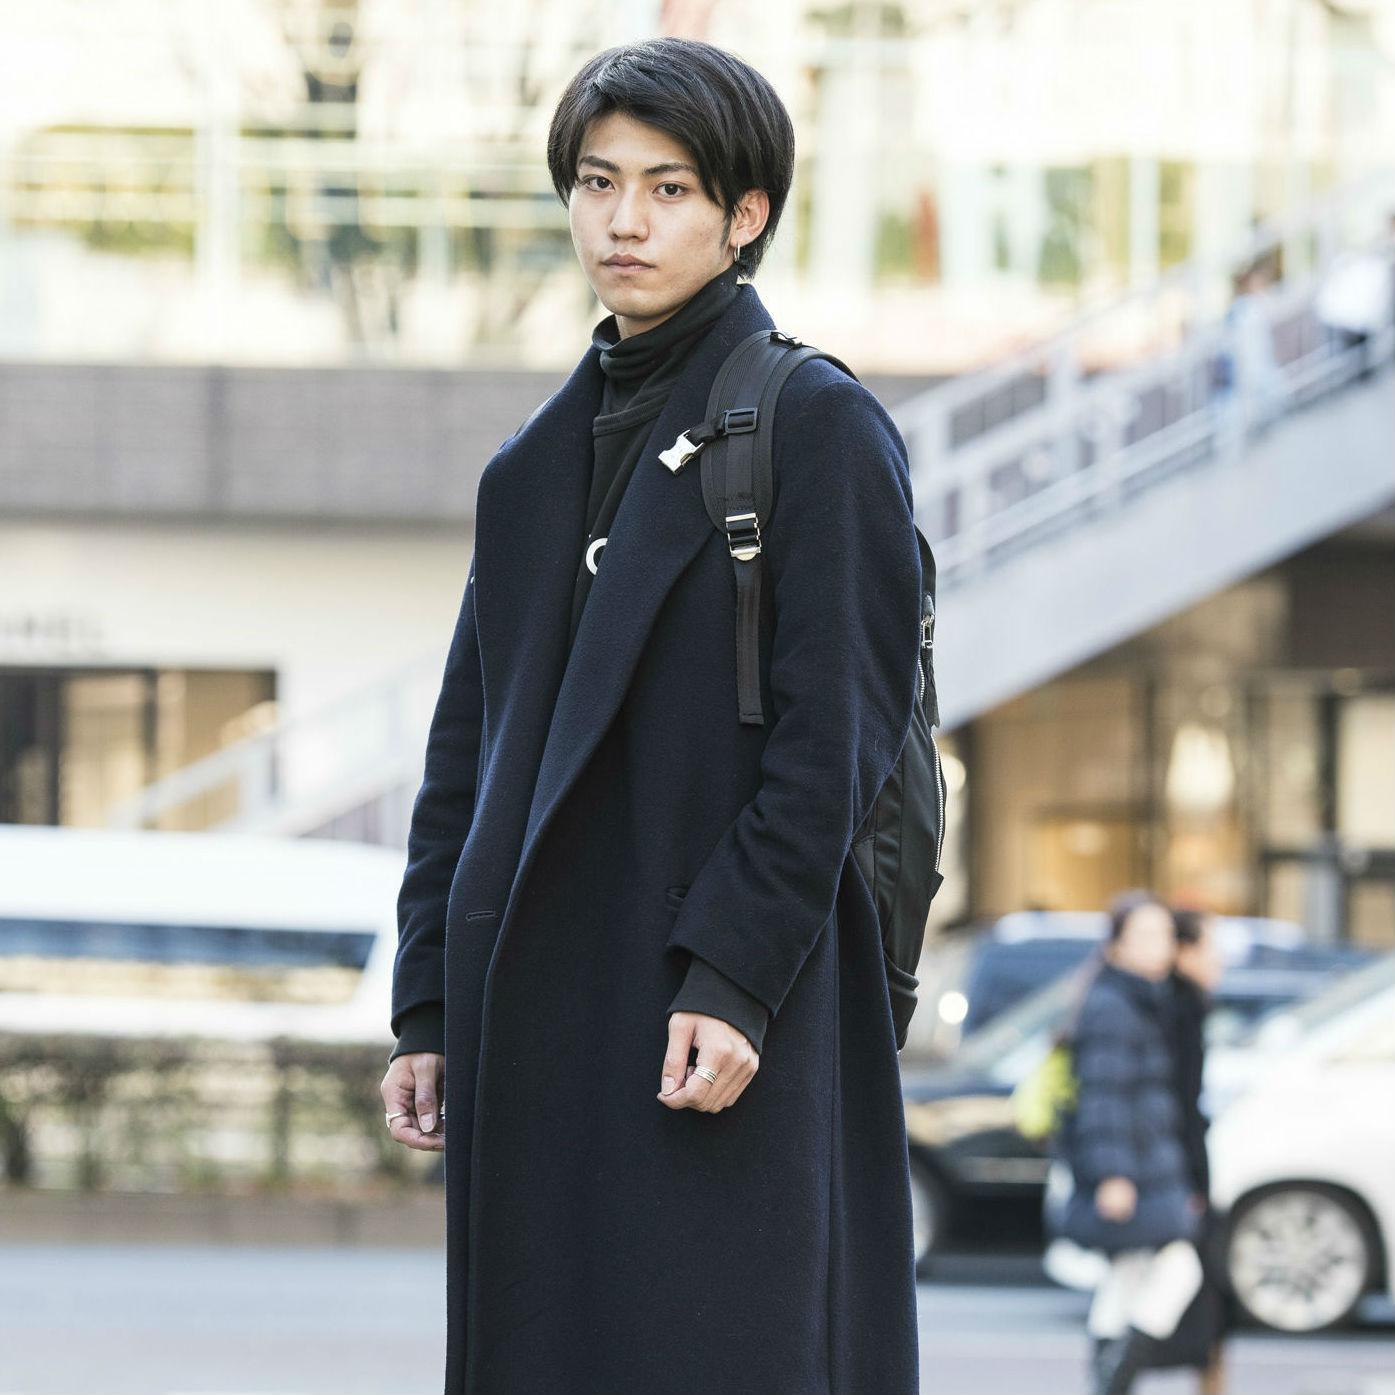 【SNAP JACK】<br />オールブラックでHigh&Low!!(プライスが)<br />井ヶ田優吾くん・東洋大学